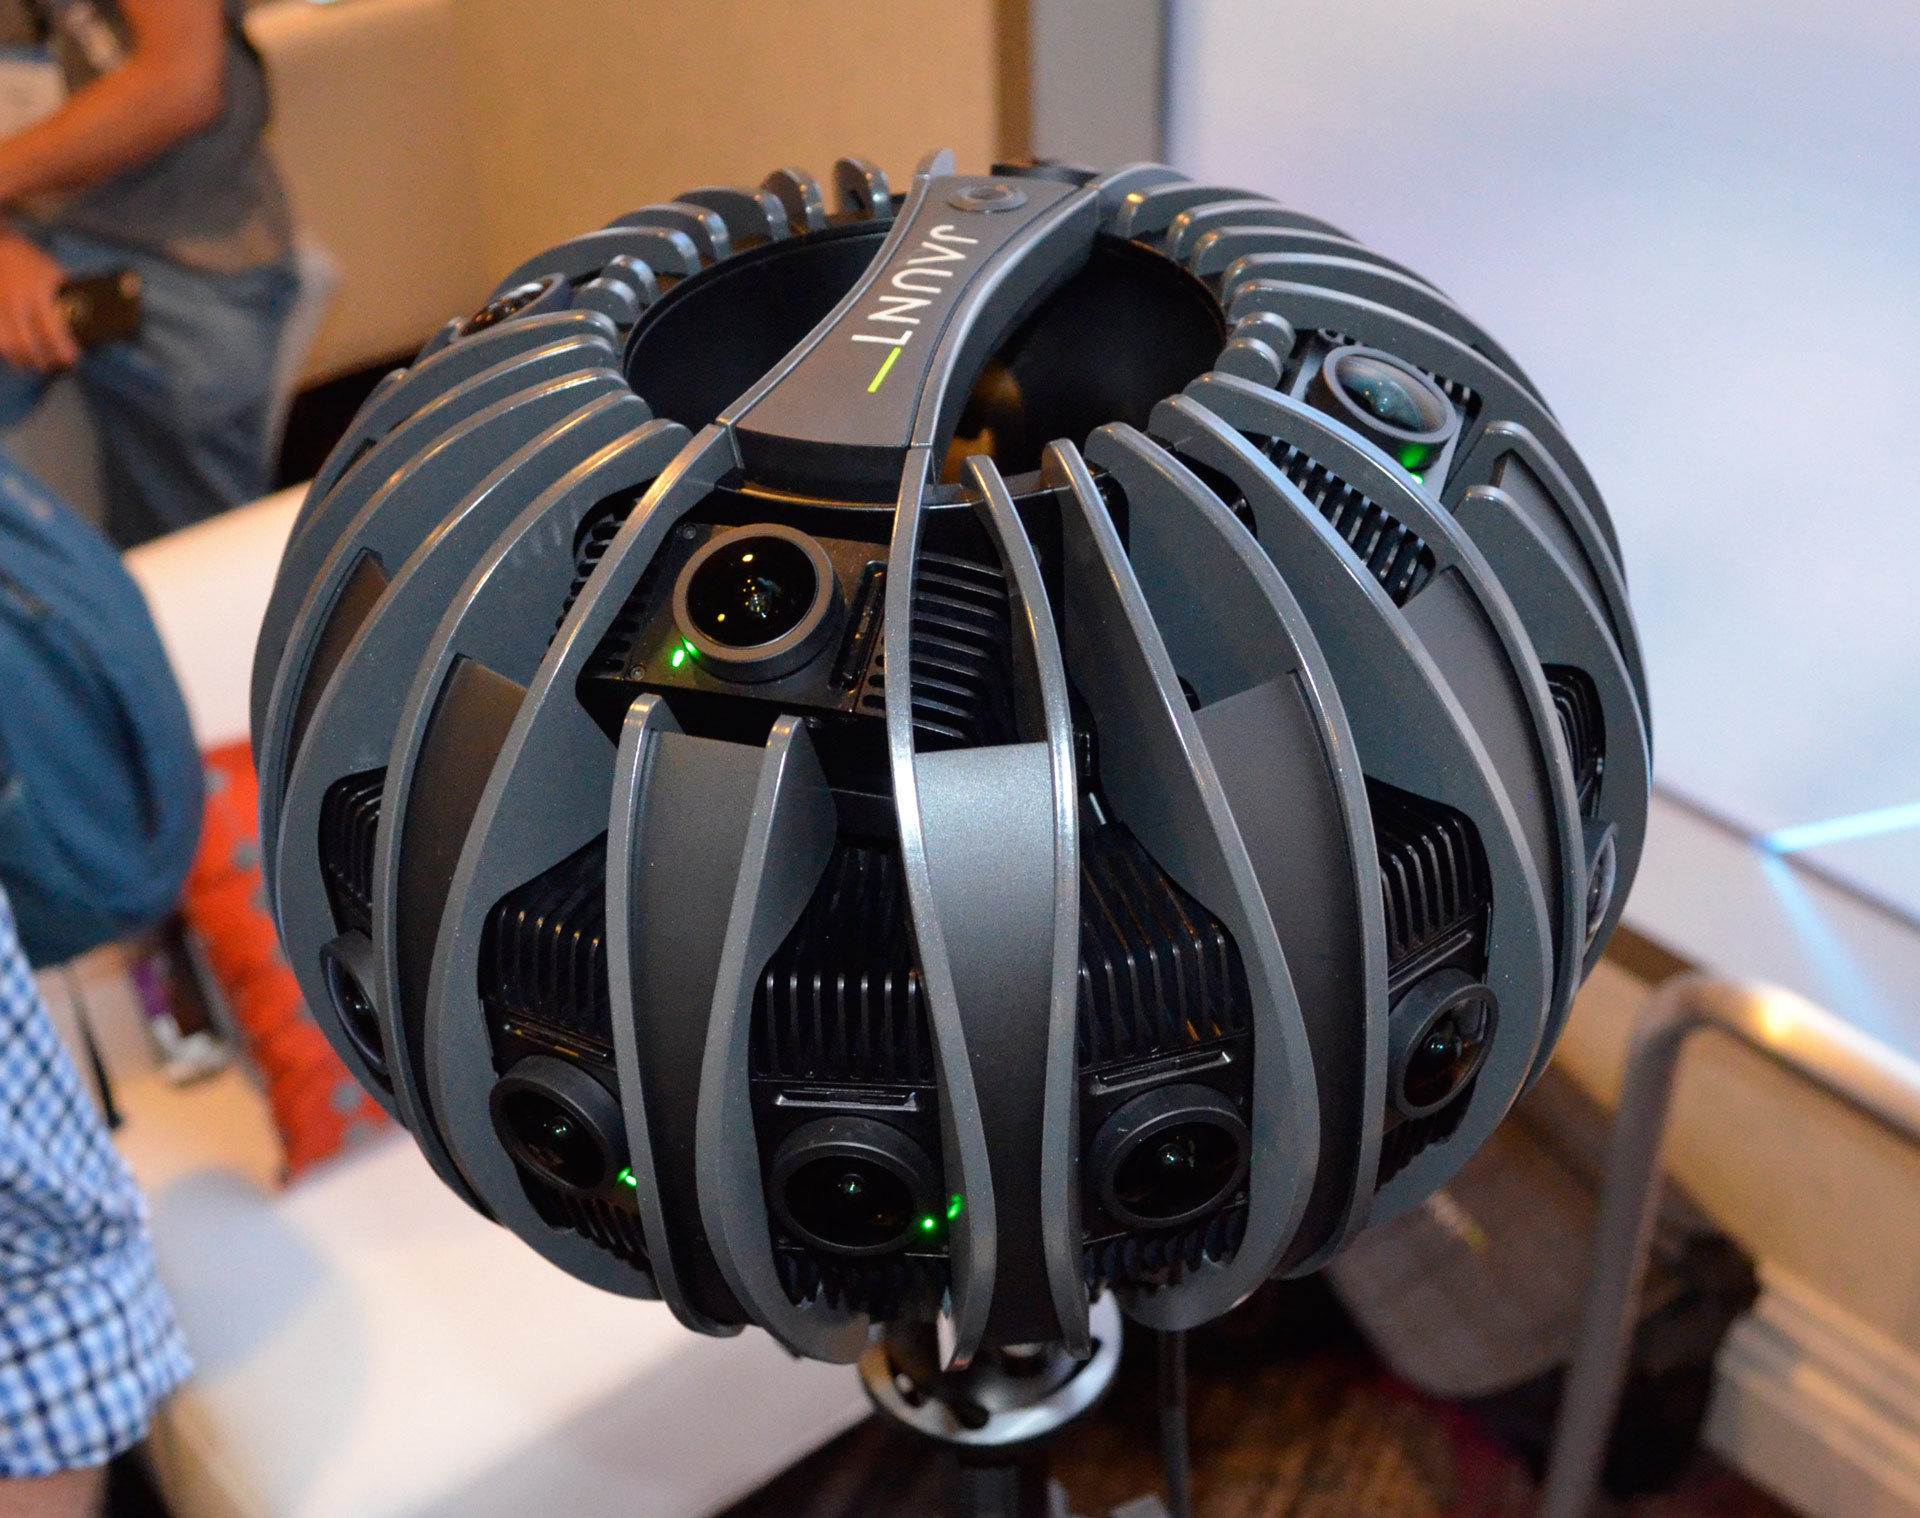 jaunt-one-vr-camera-neo-6.jpg